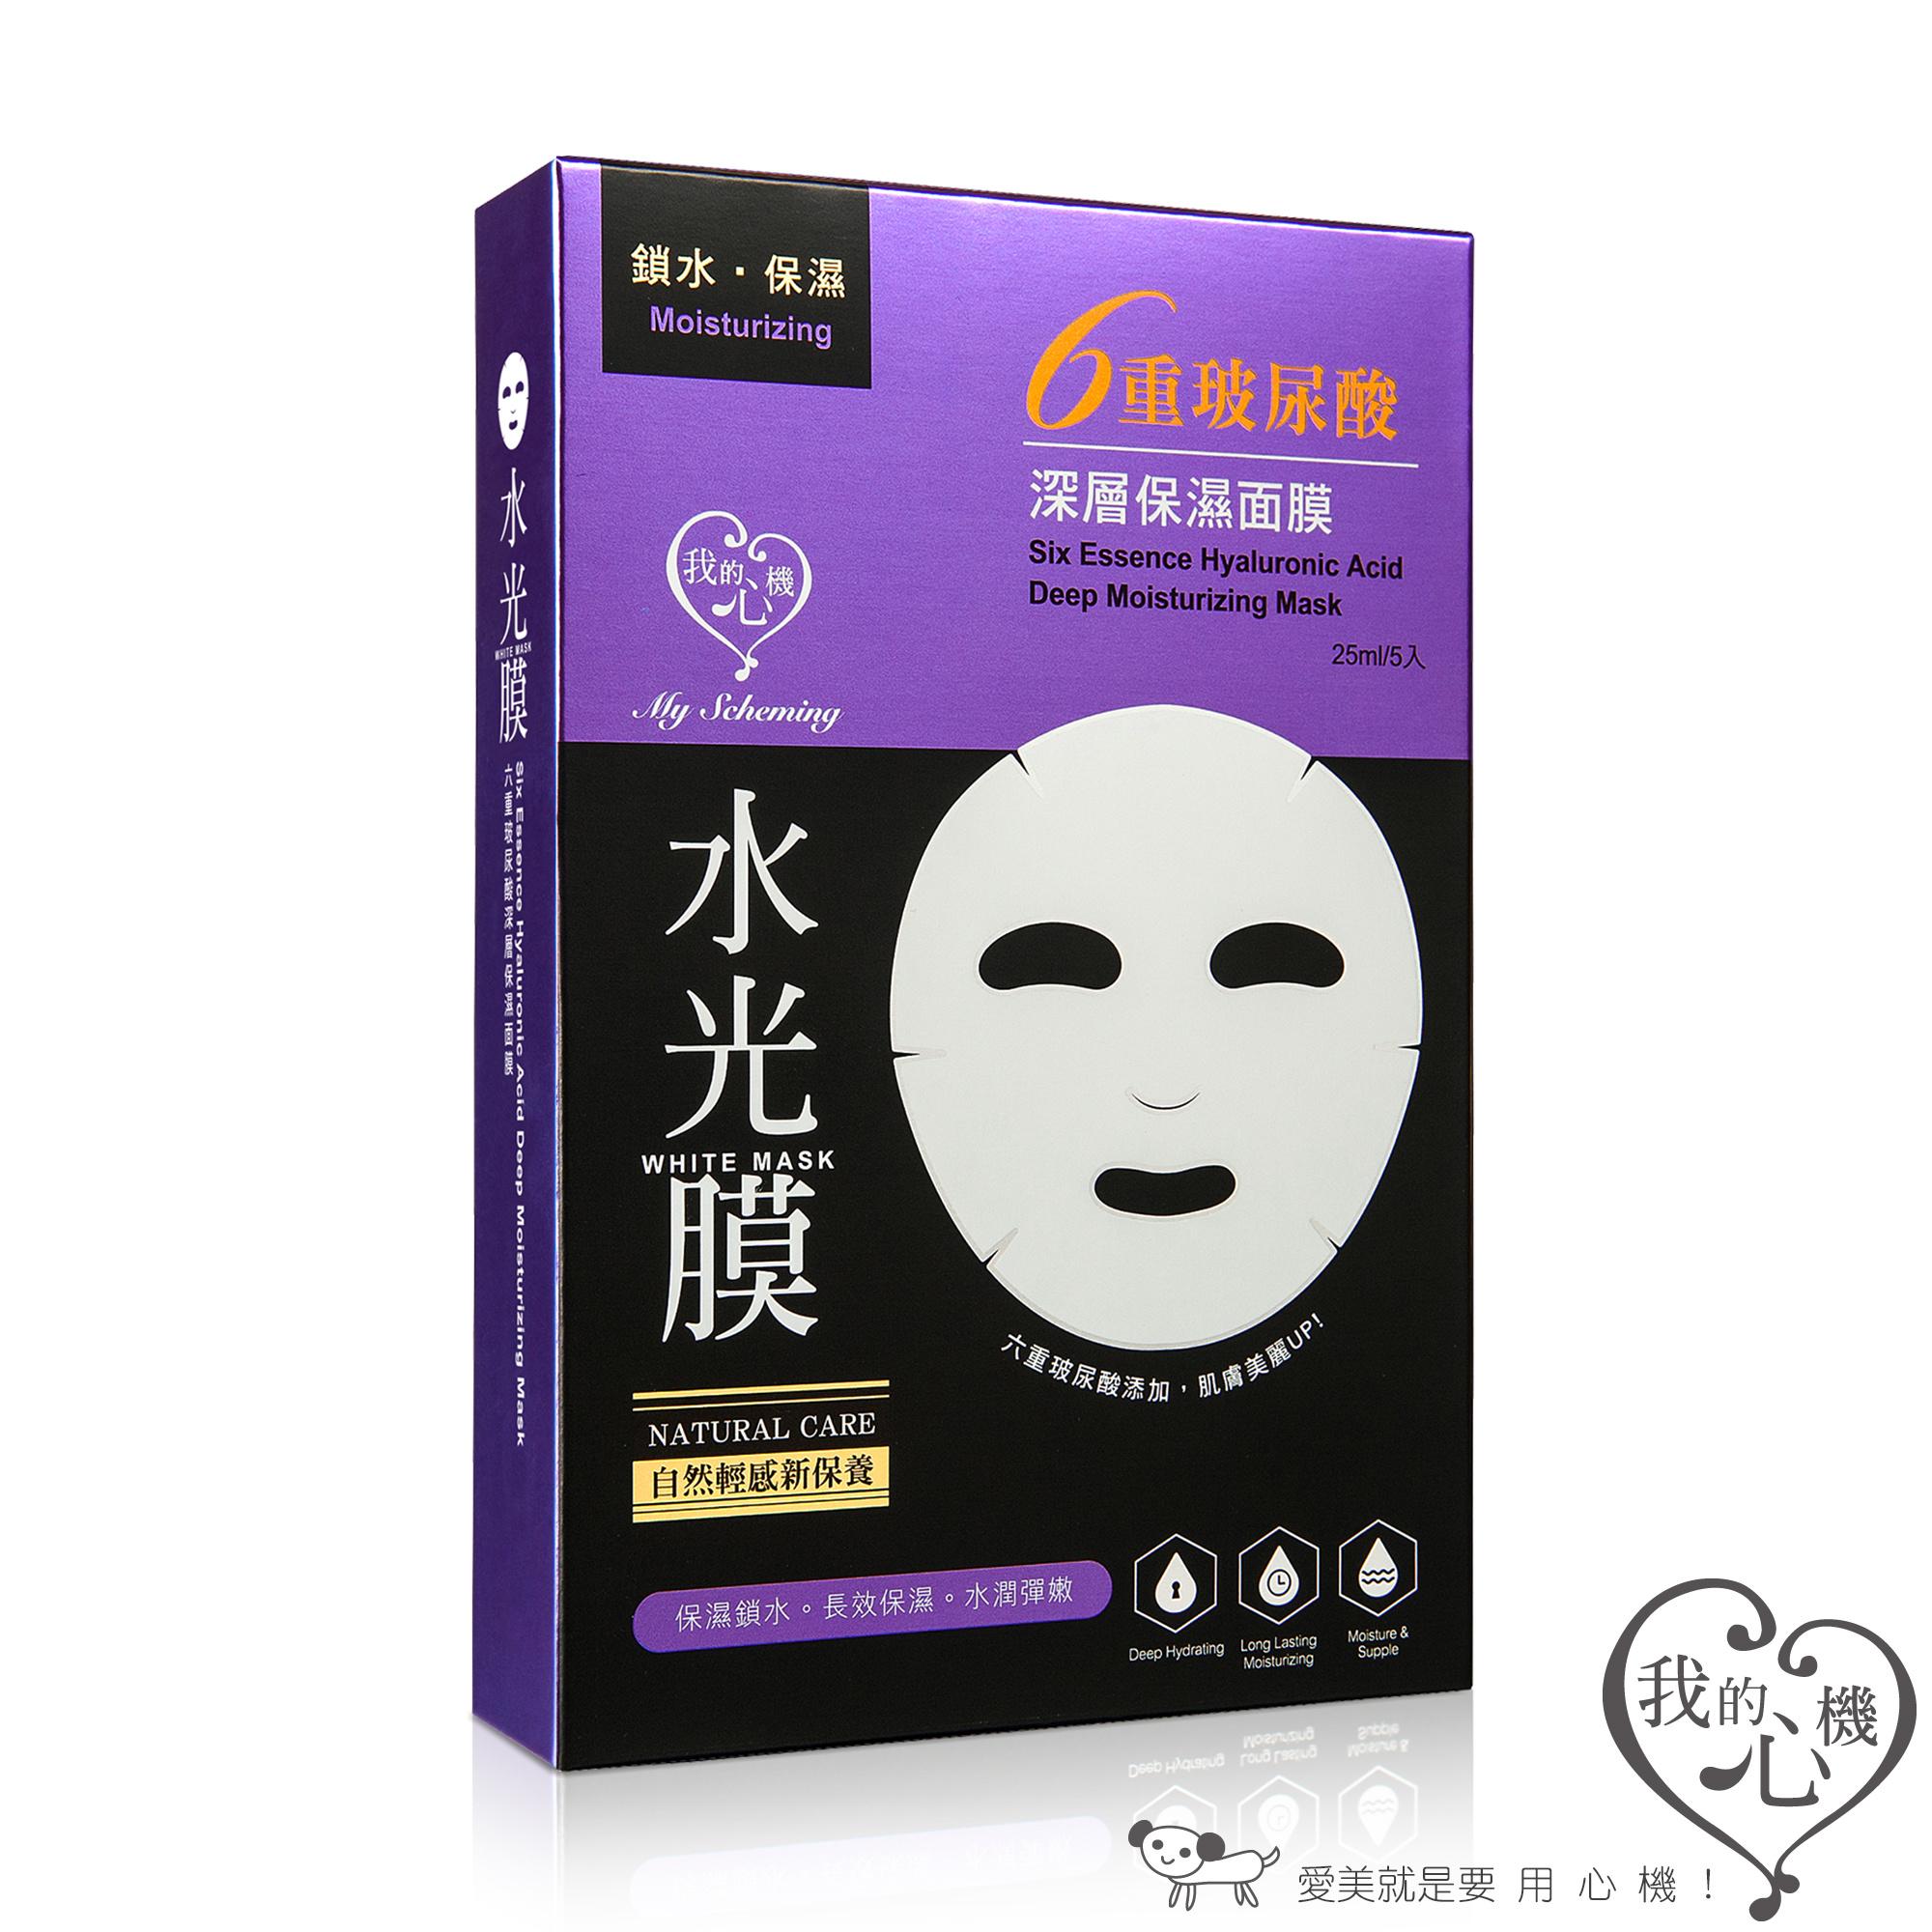 Six Essence Hyaluronic Acid Deep Moisturizing Mask (5 pcs)-1